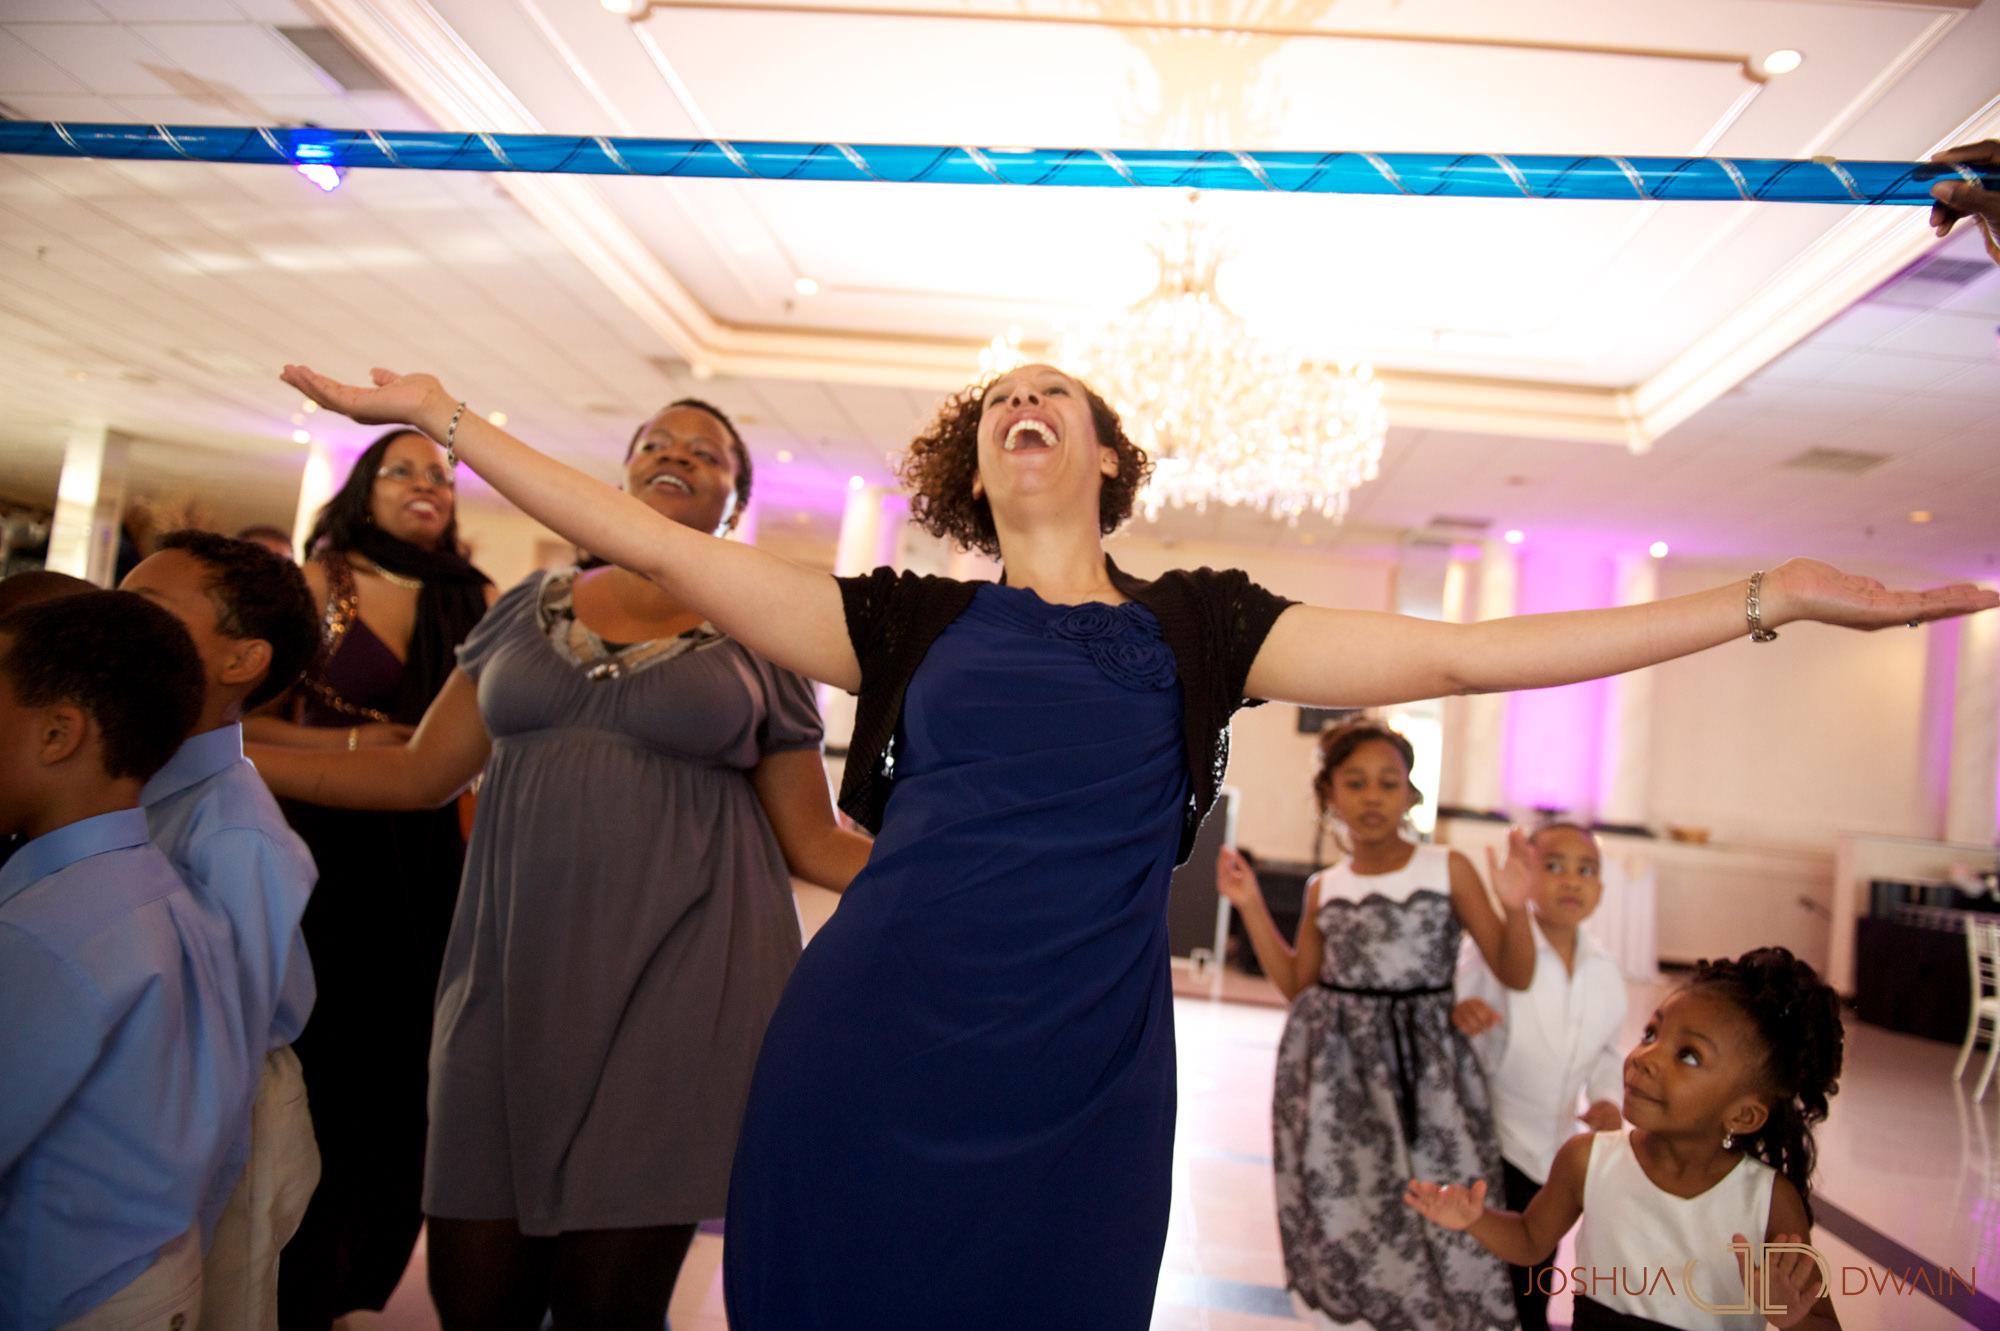 natifia-don-016-greentree-country-clubnew-rochelle-new-york-wedding-photographer-joshua-dwain-20101023_dn_0806